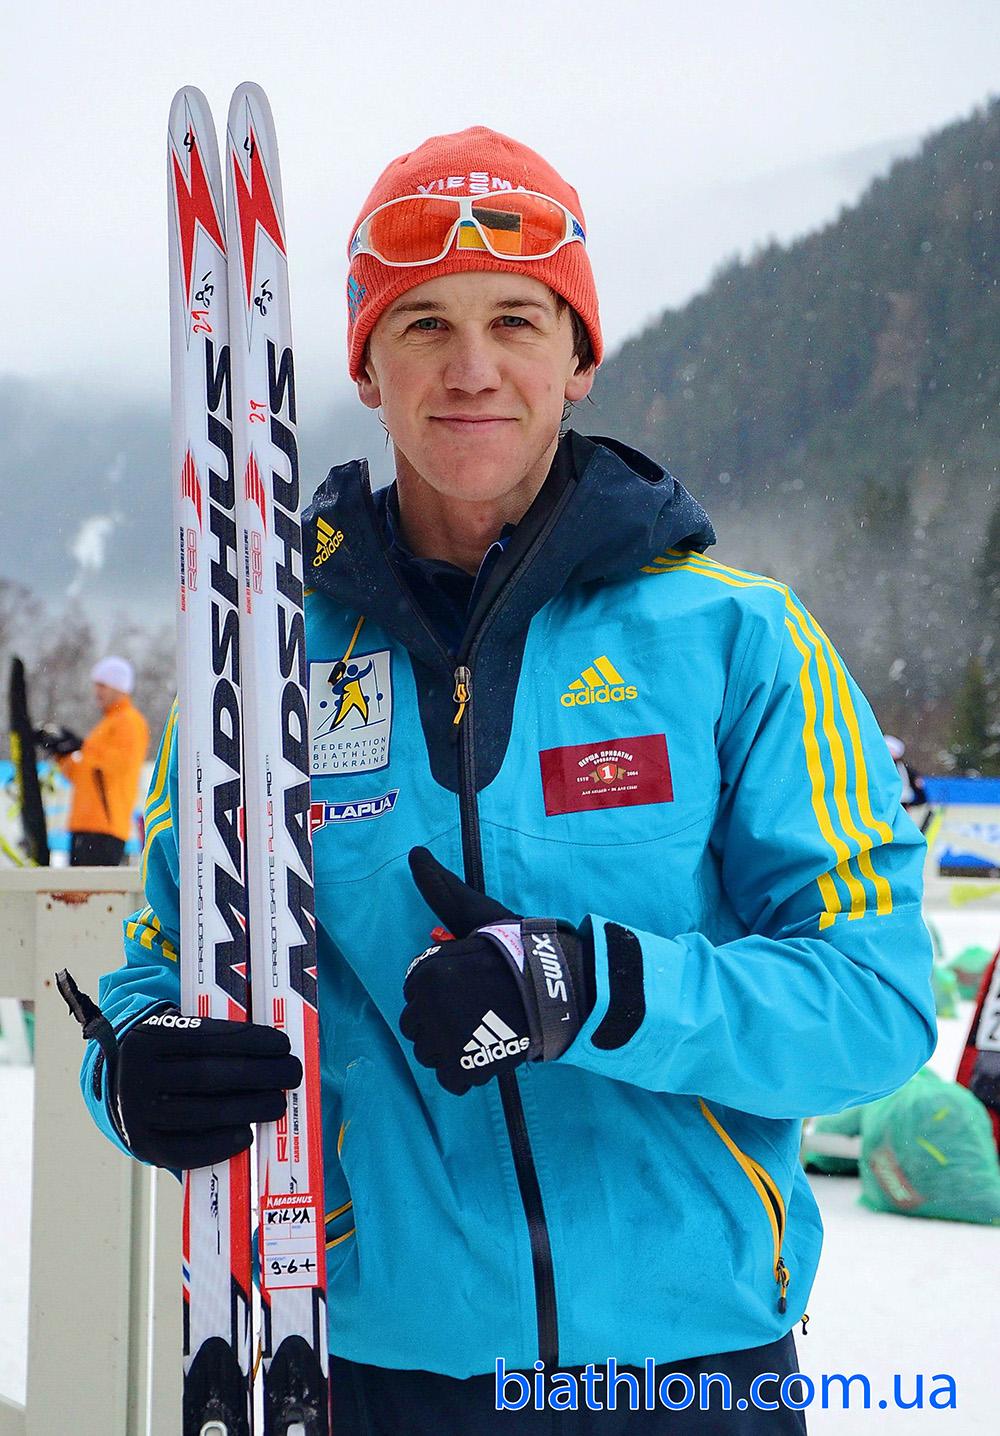 http://www.biathlon.com.ua/uploads/2014/58430.jpg